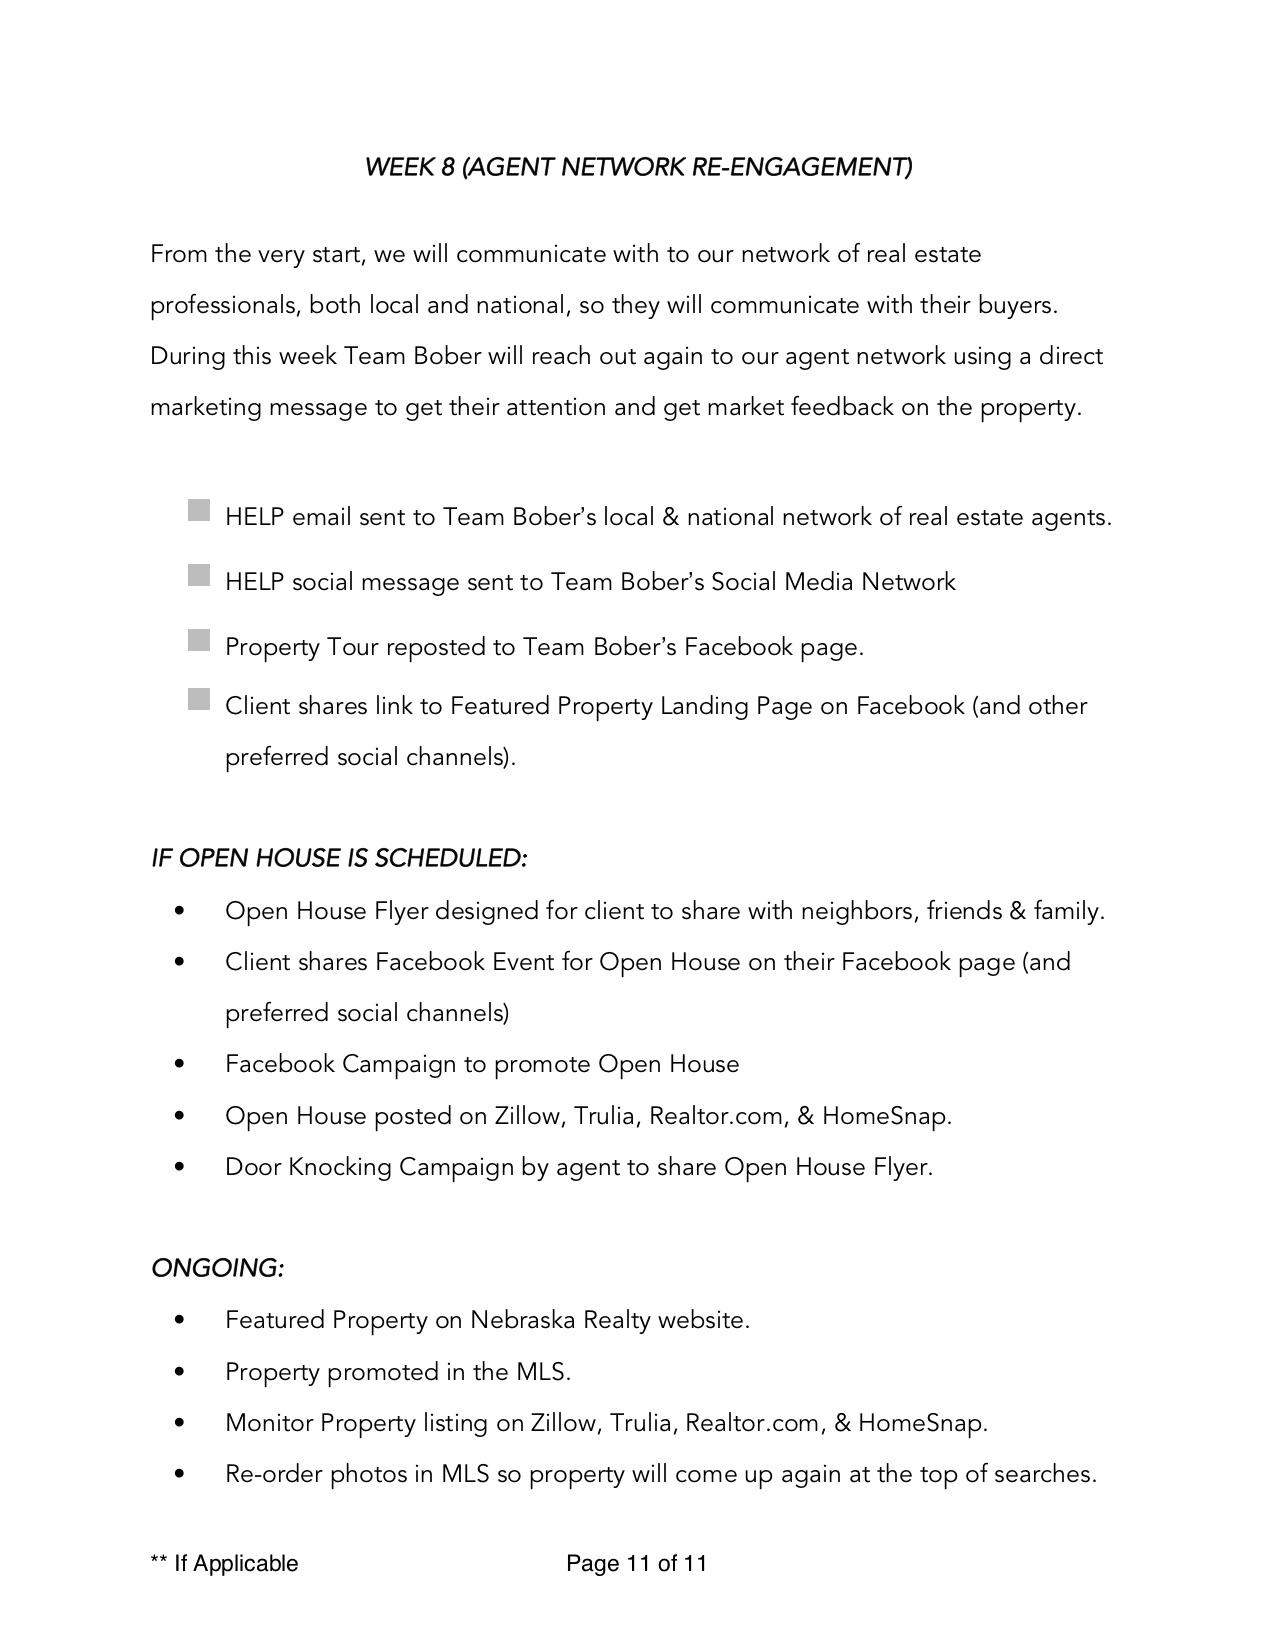 8 Week Marketing Plan11.jpg